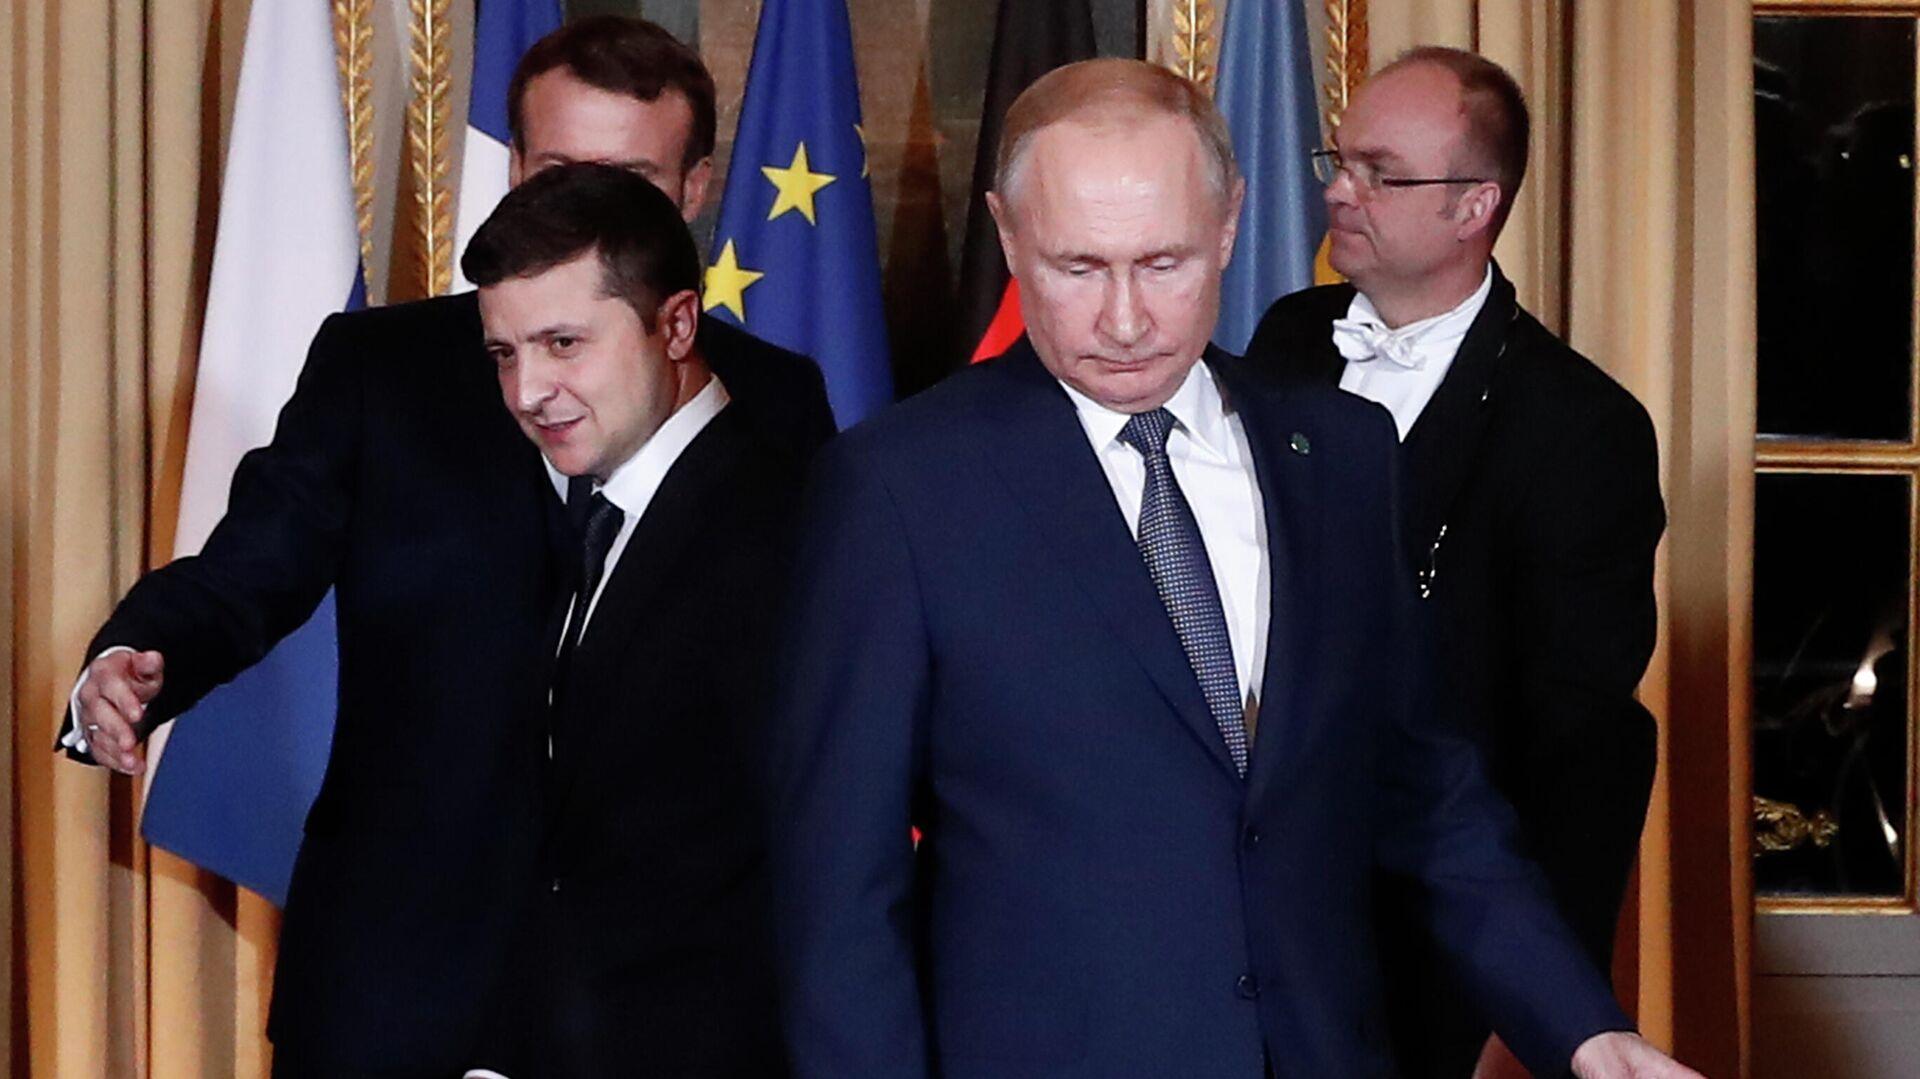 Президент России Владимир Путин (справа) и президент Украины Владимир Зеленский на саммите в Париже - РИА Новости, 1920, 26.09.2021